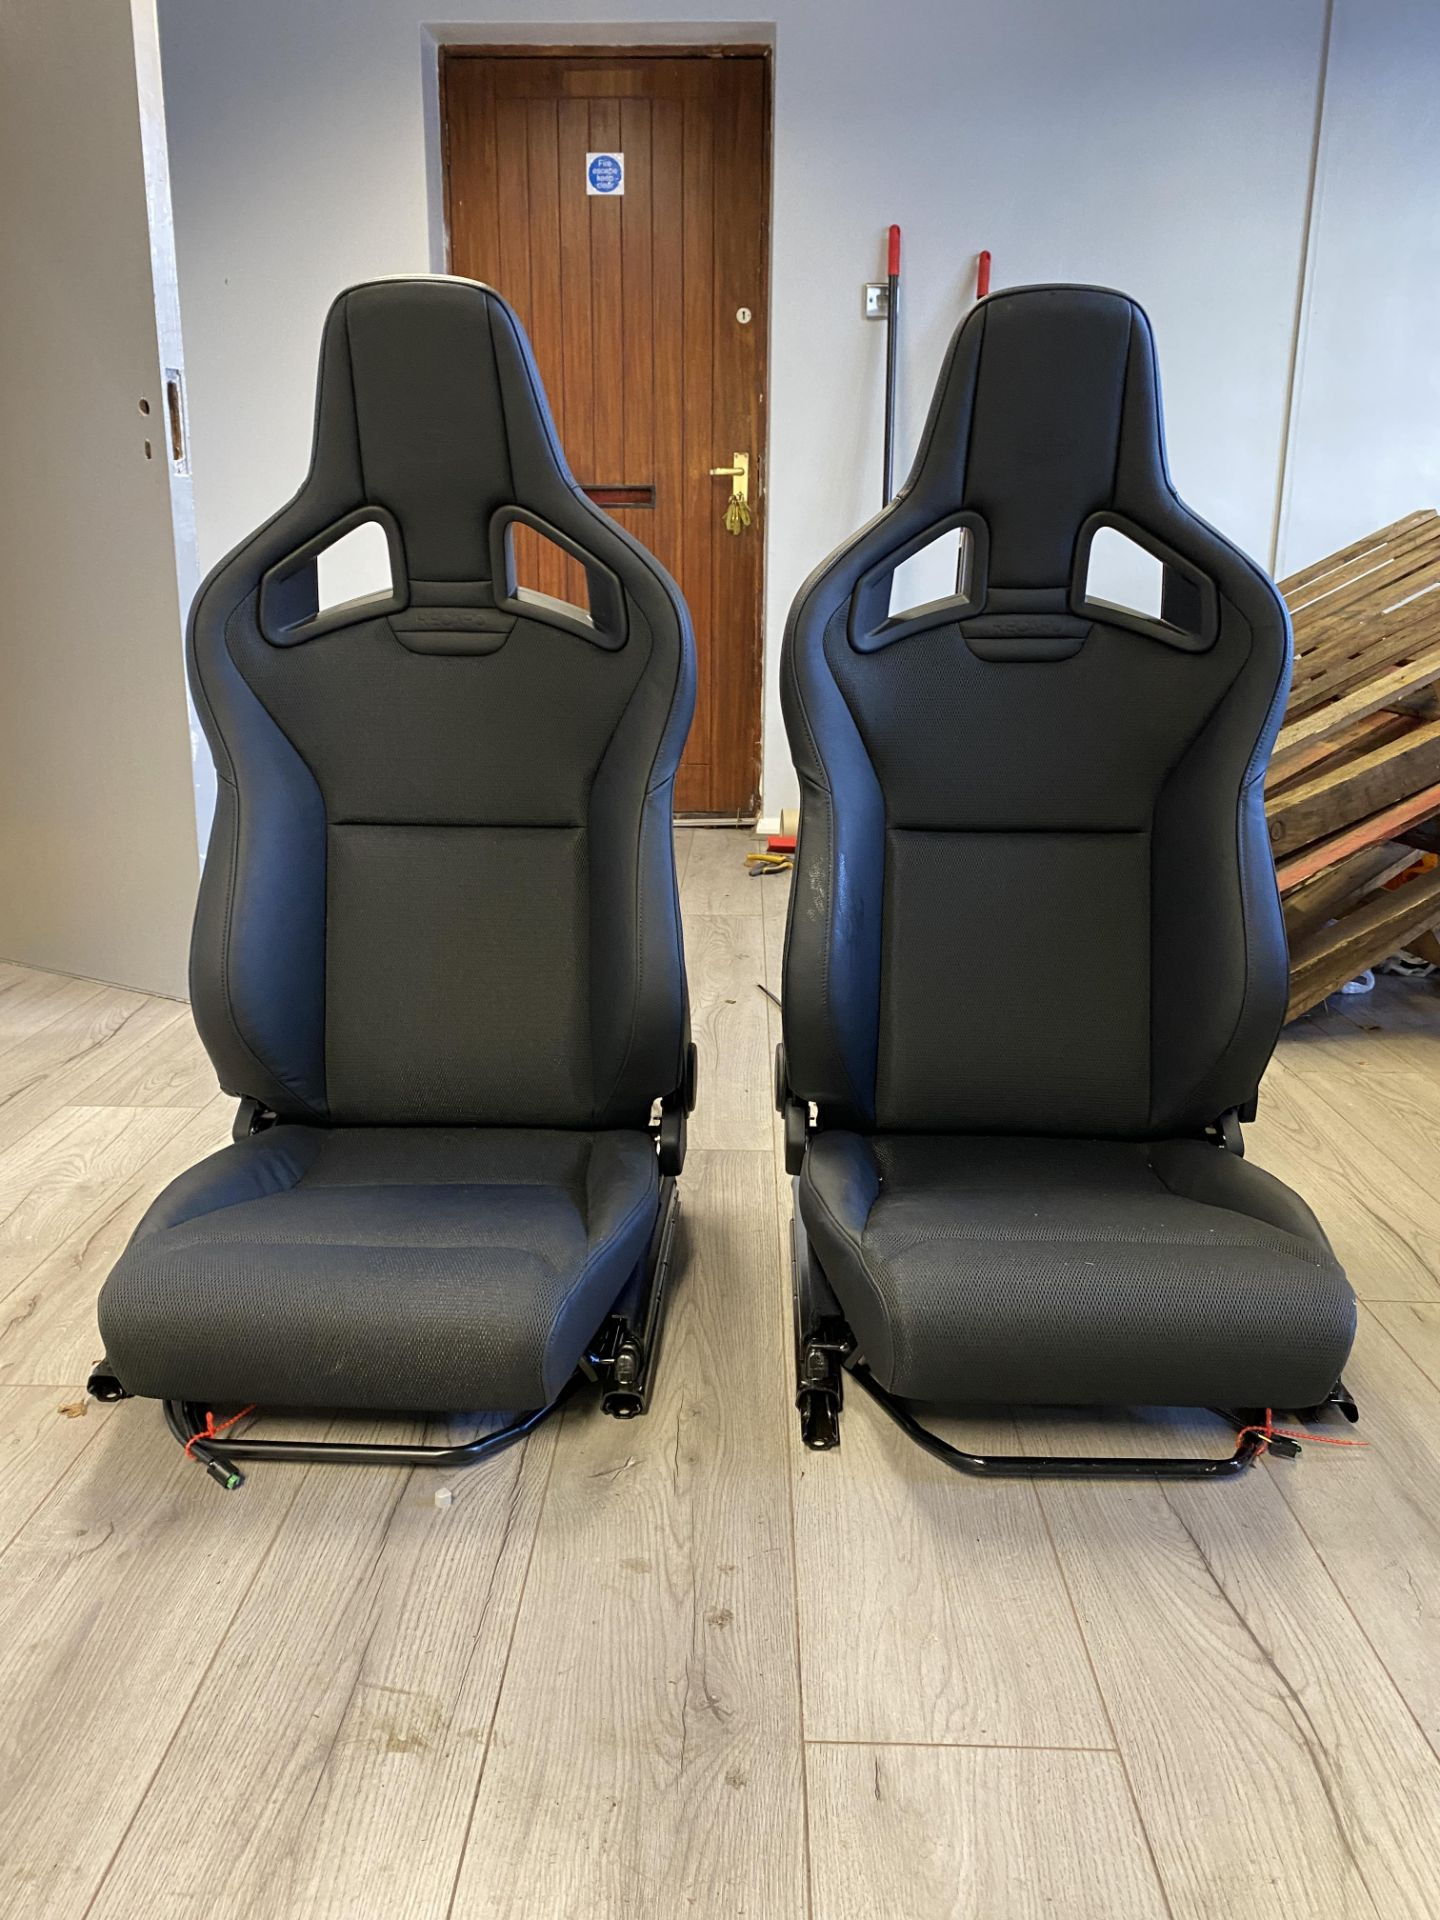 Pair of LH & RH Genuine Recaro Defender Heated Seats - Image 4 of 35